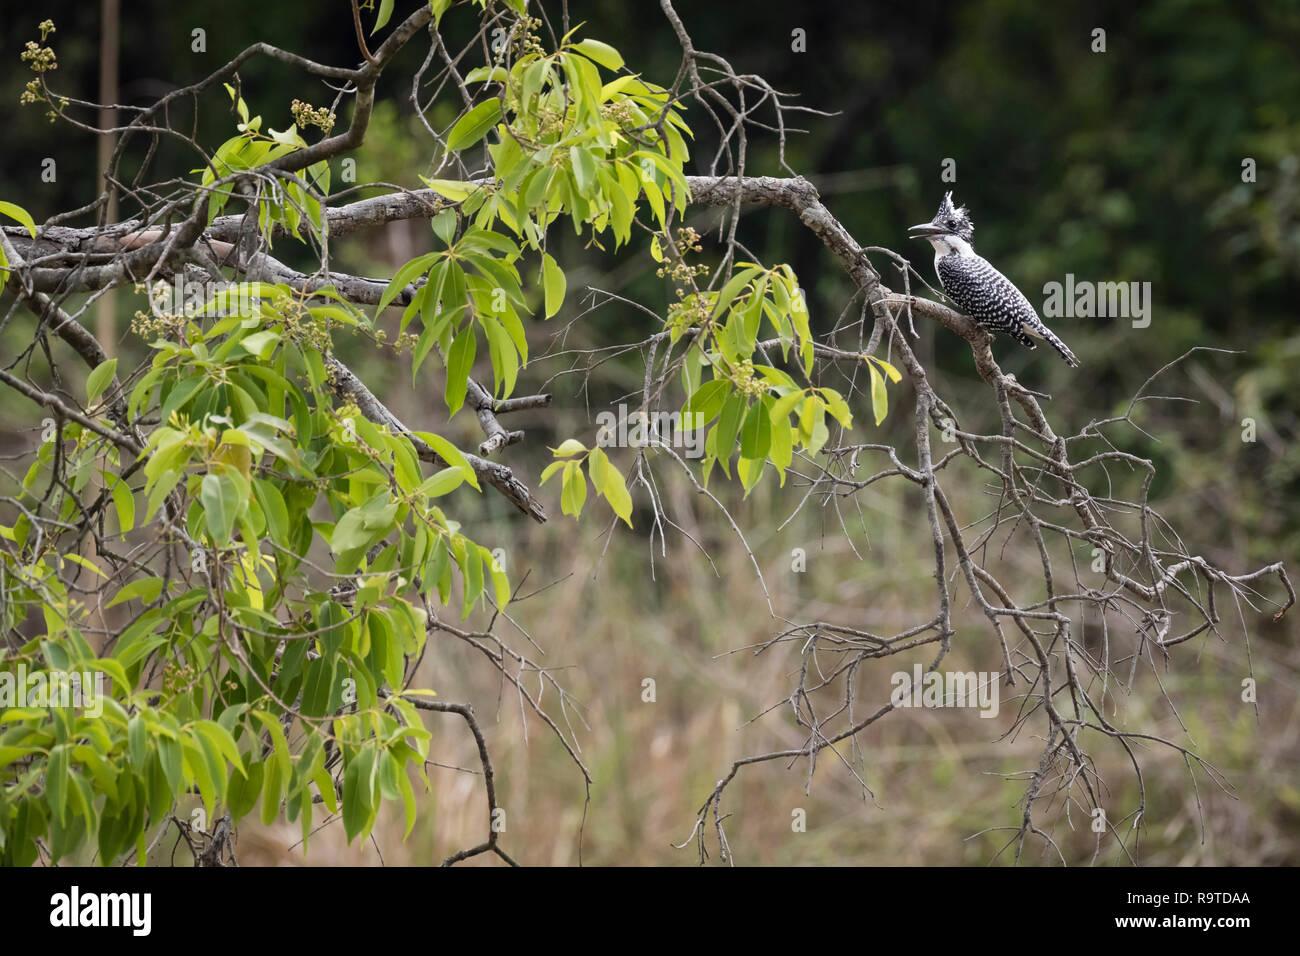 Crested Kingfisher (Megaceryle lugubris) perched on branch. Corbett National Park. Uttarakhand. India. - Stock Image